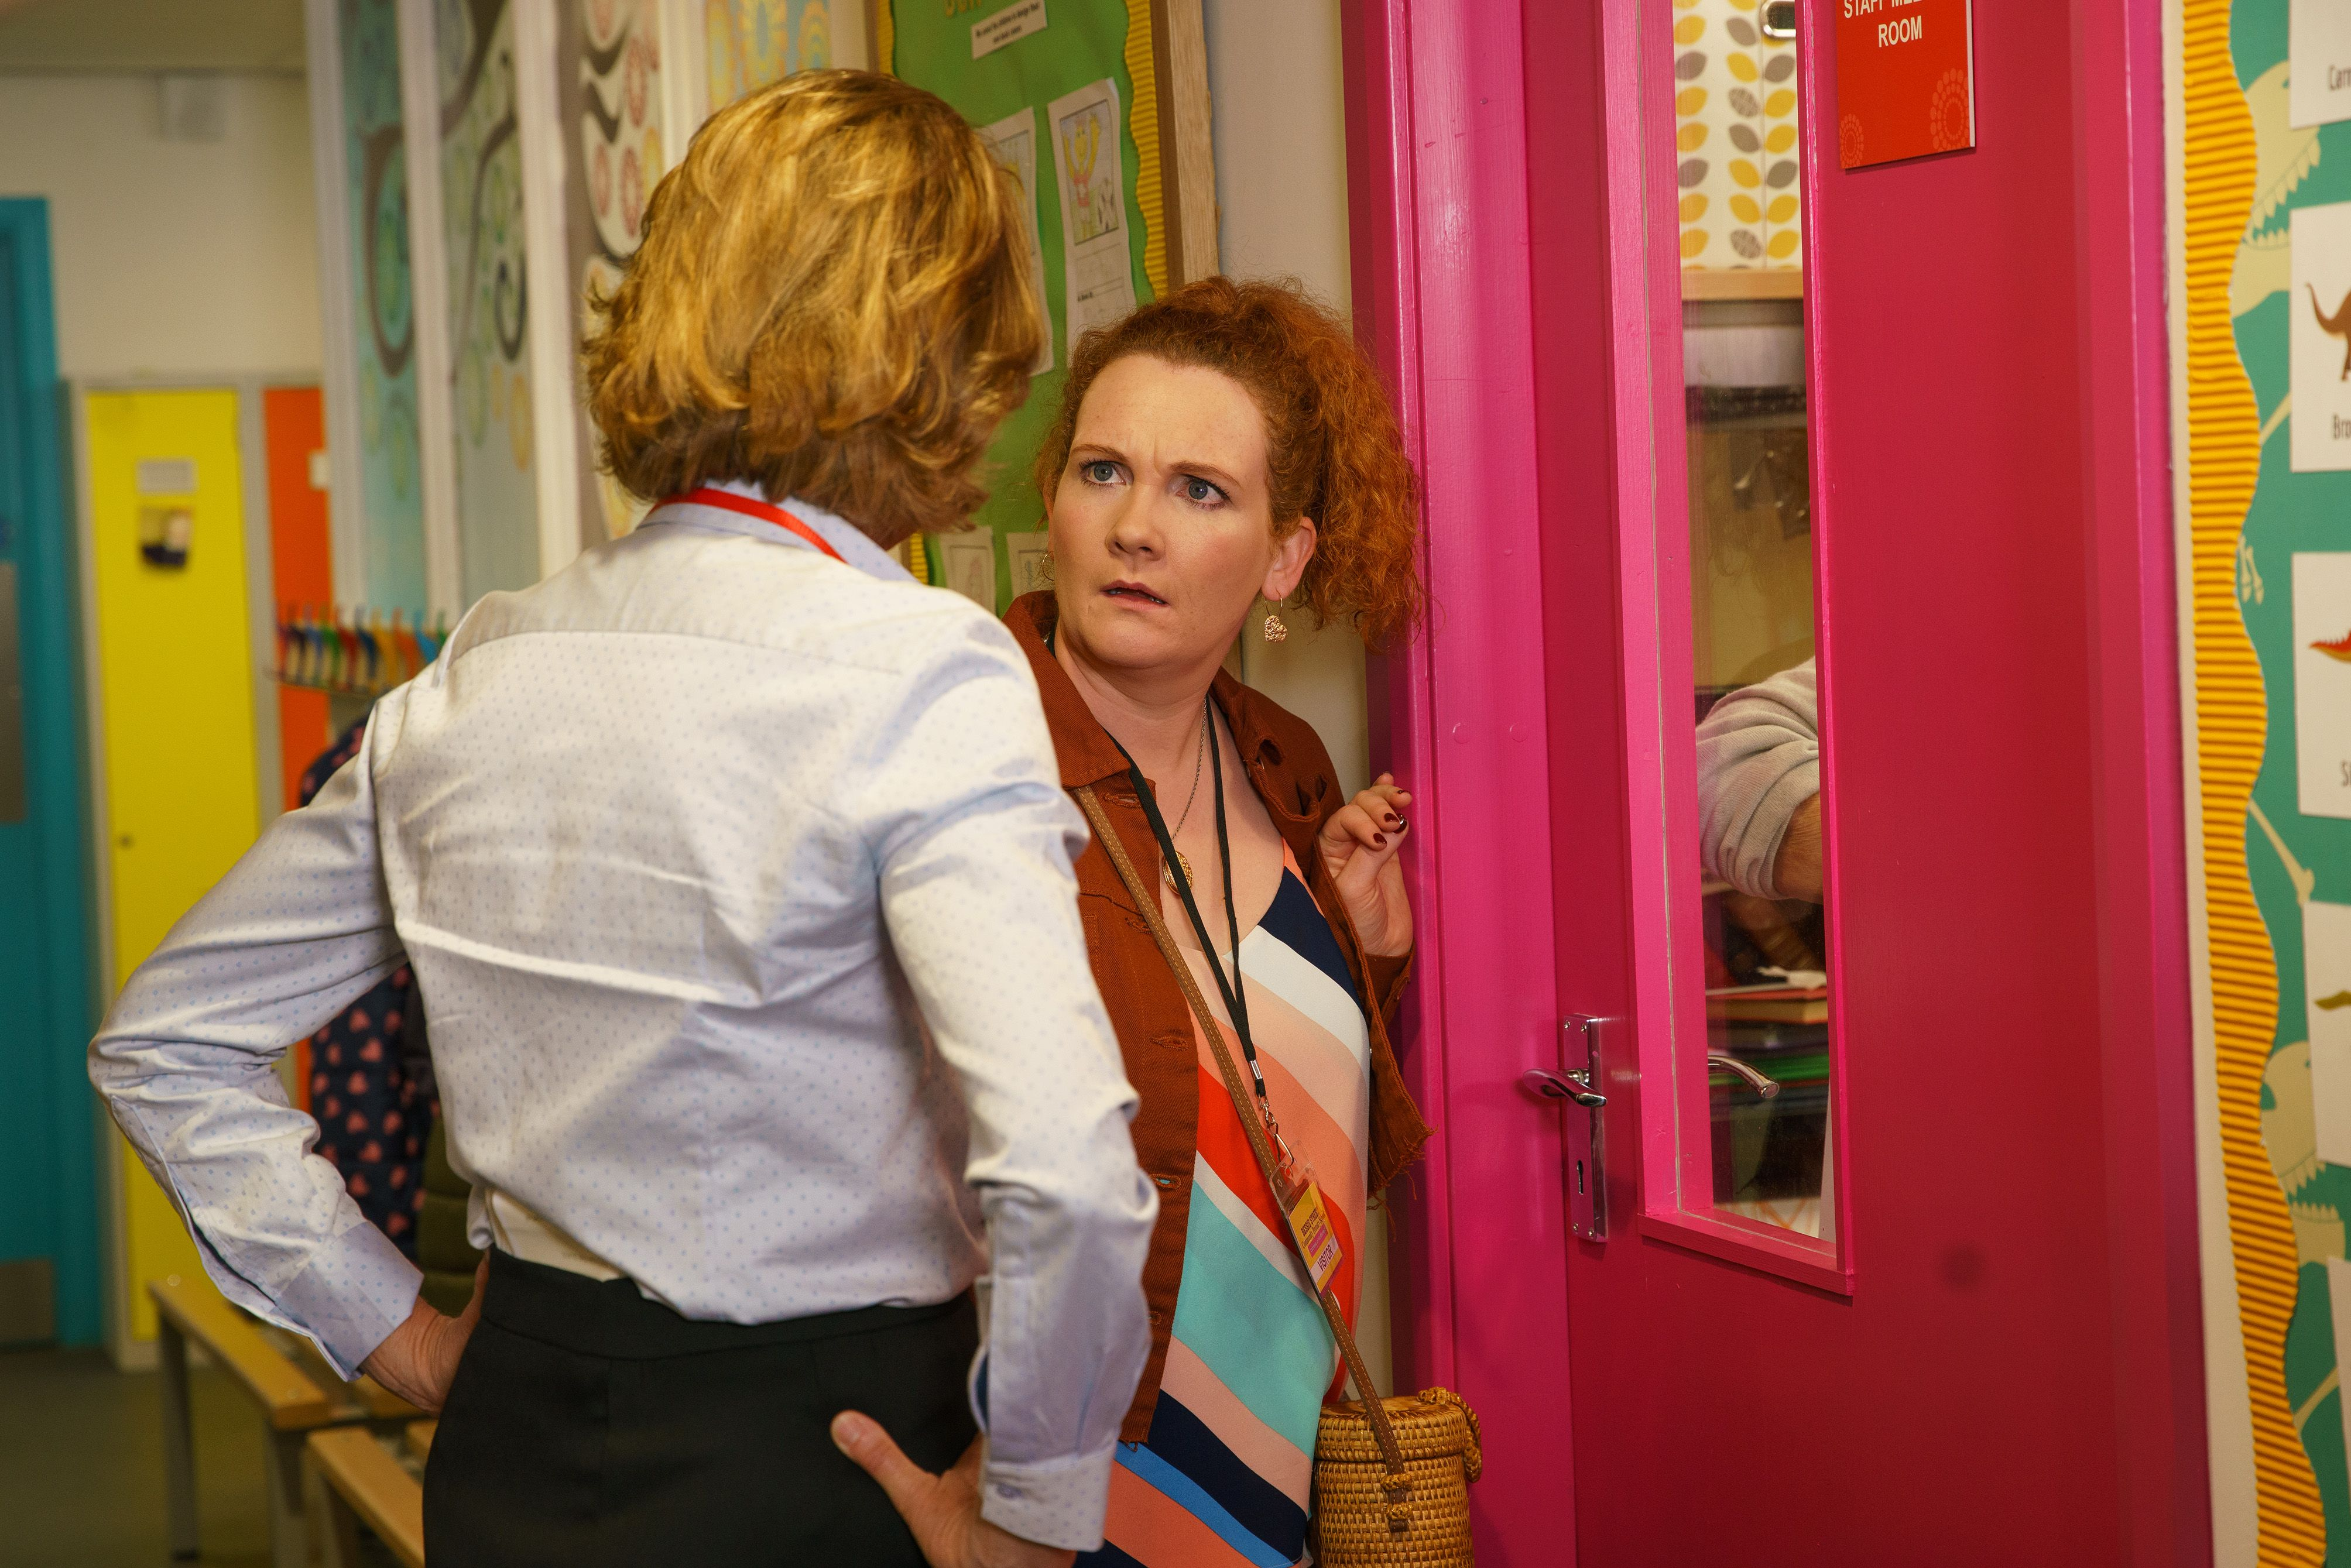 Coronation Street: Fiz Stape's return drama revealed in 23 spoiler pictures